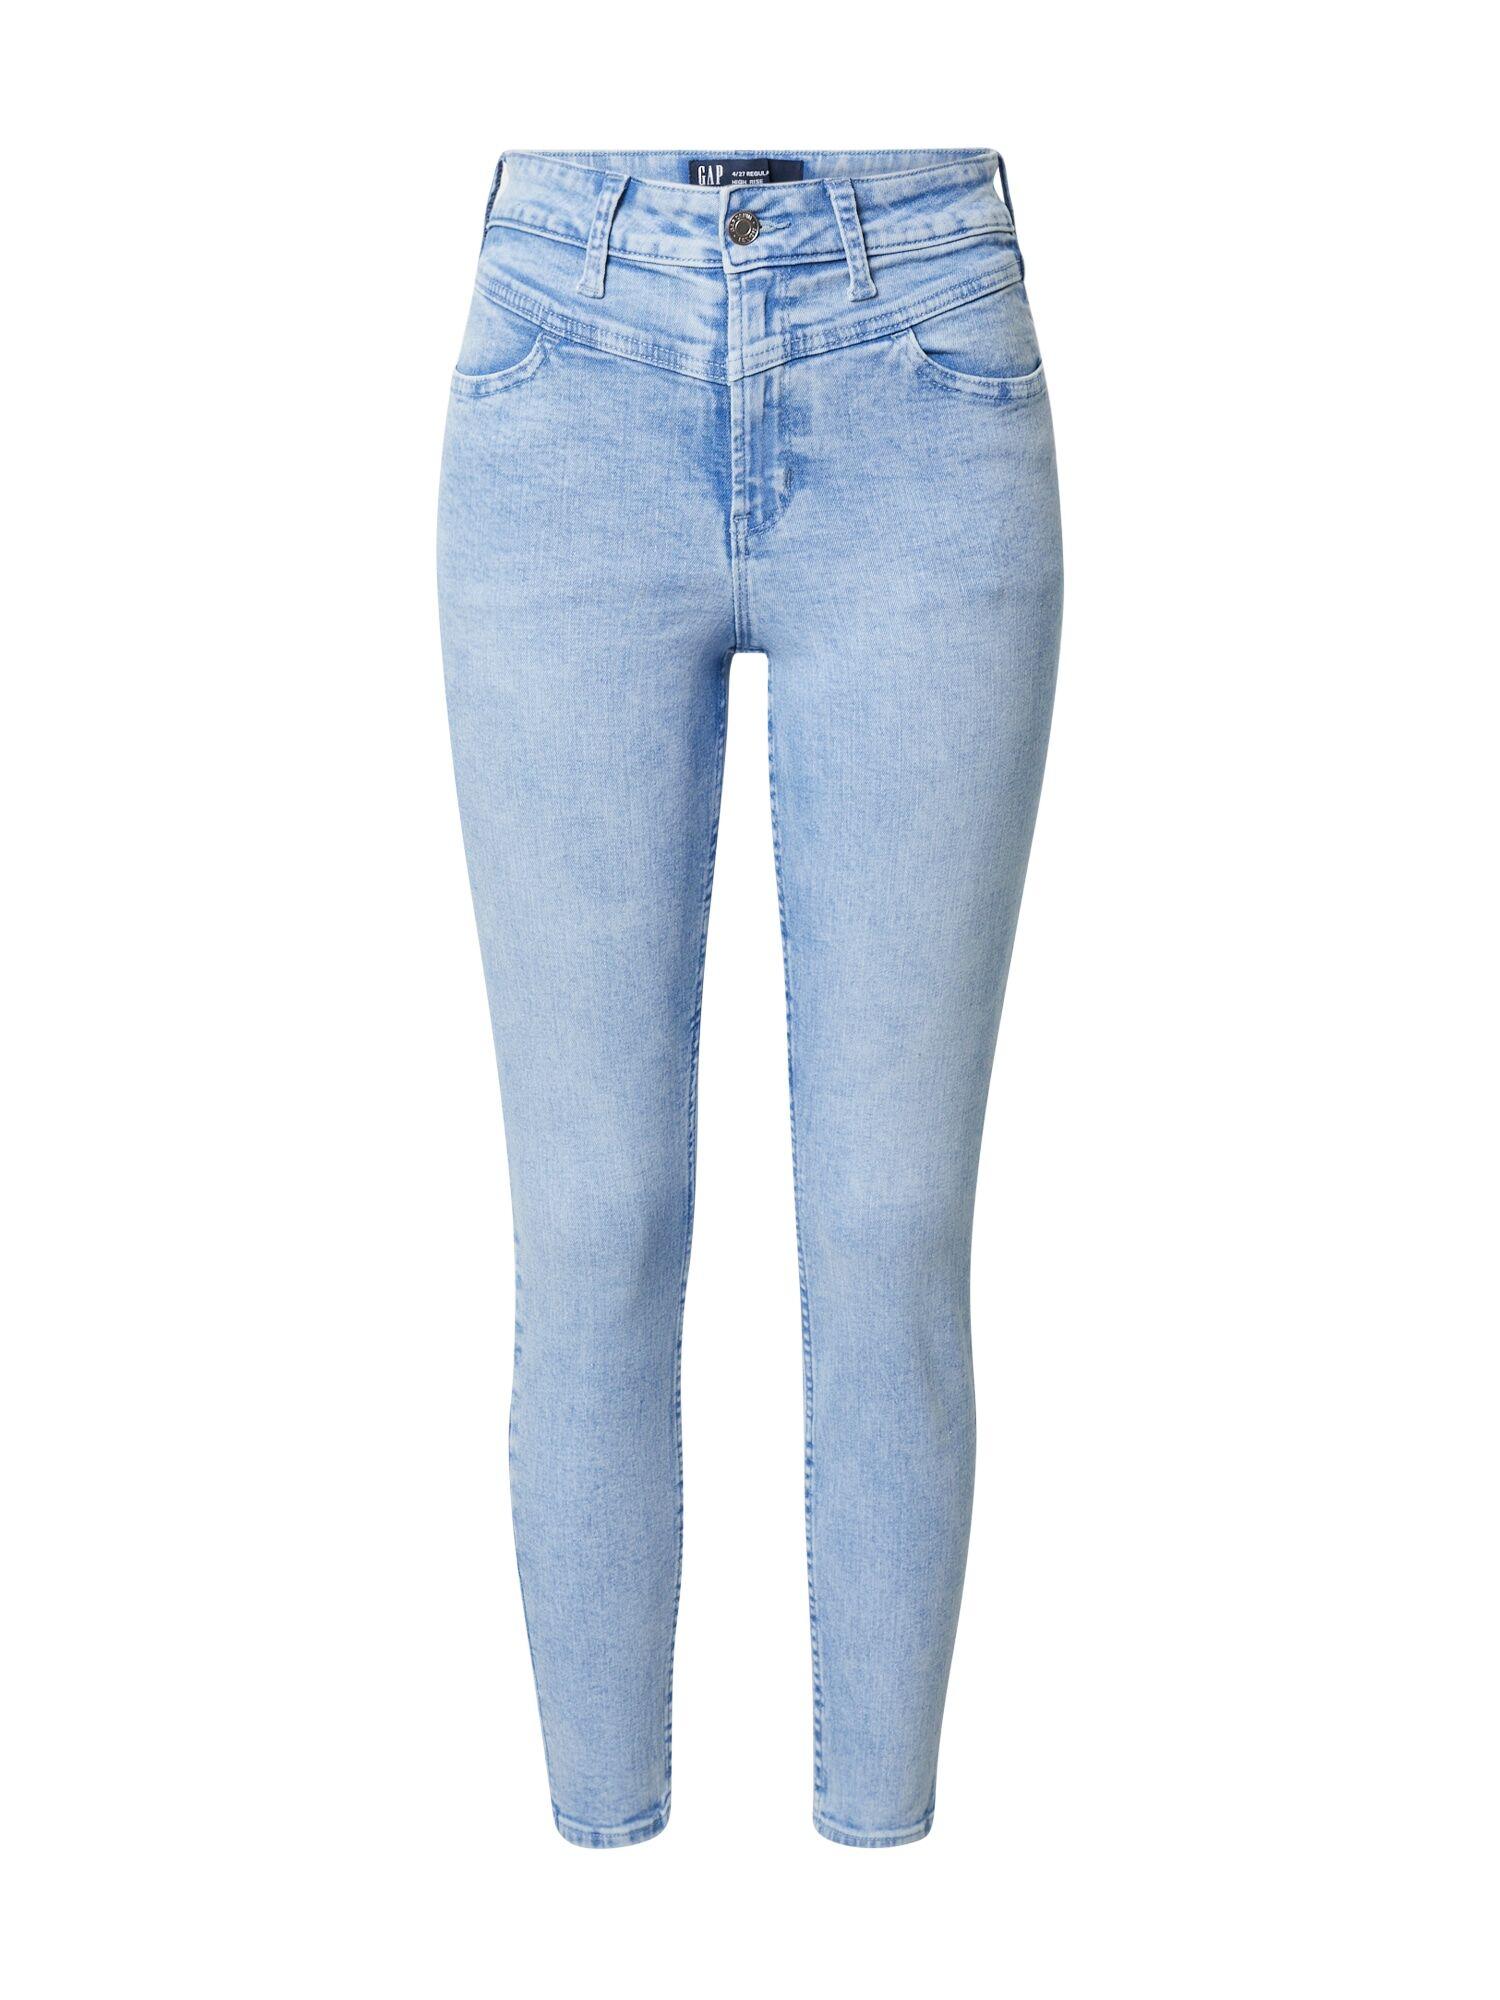 GAP Jean  - Bleu - Taille: 31 - female